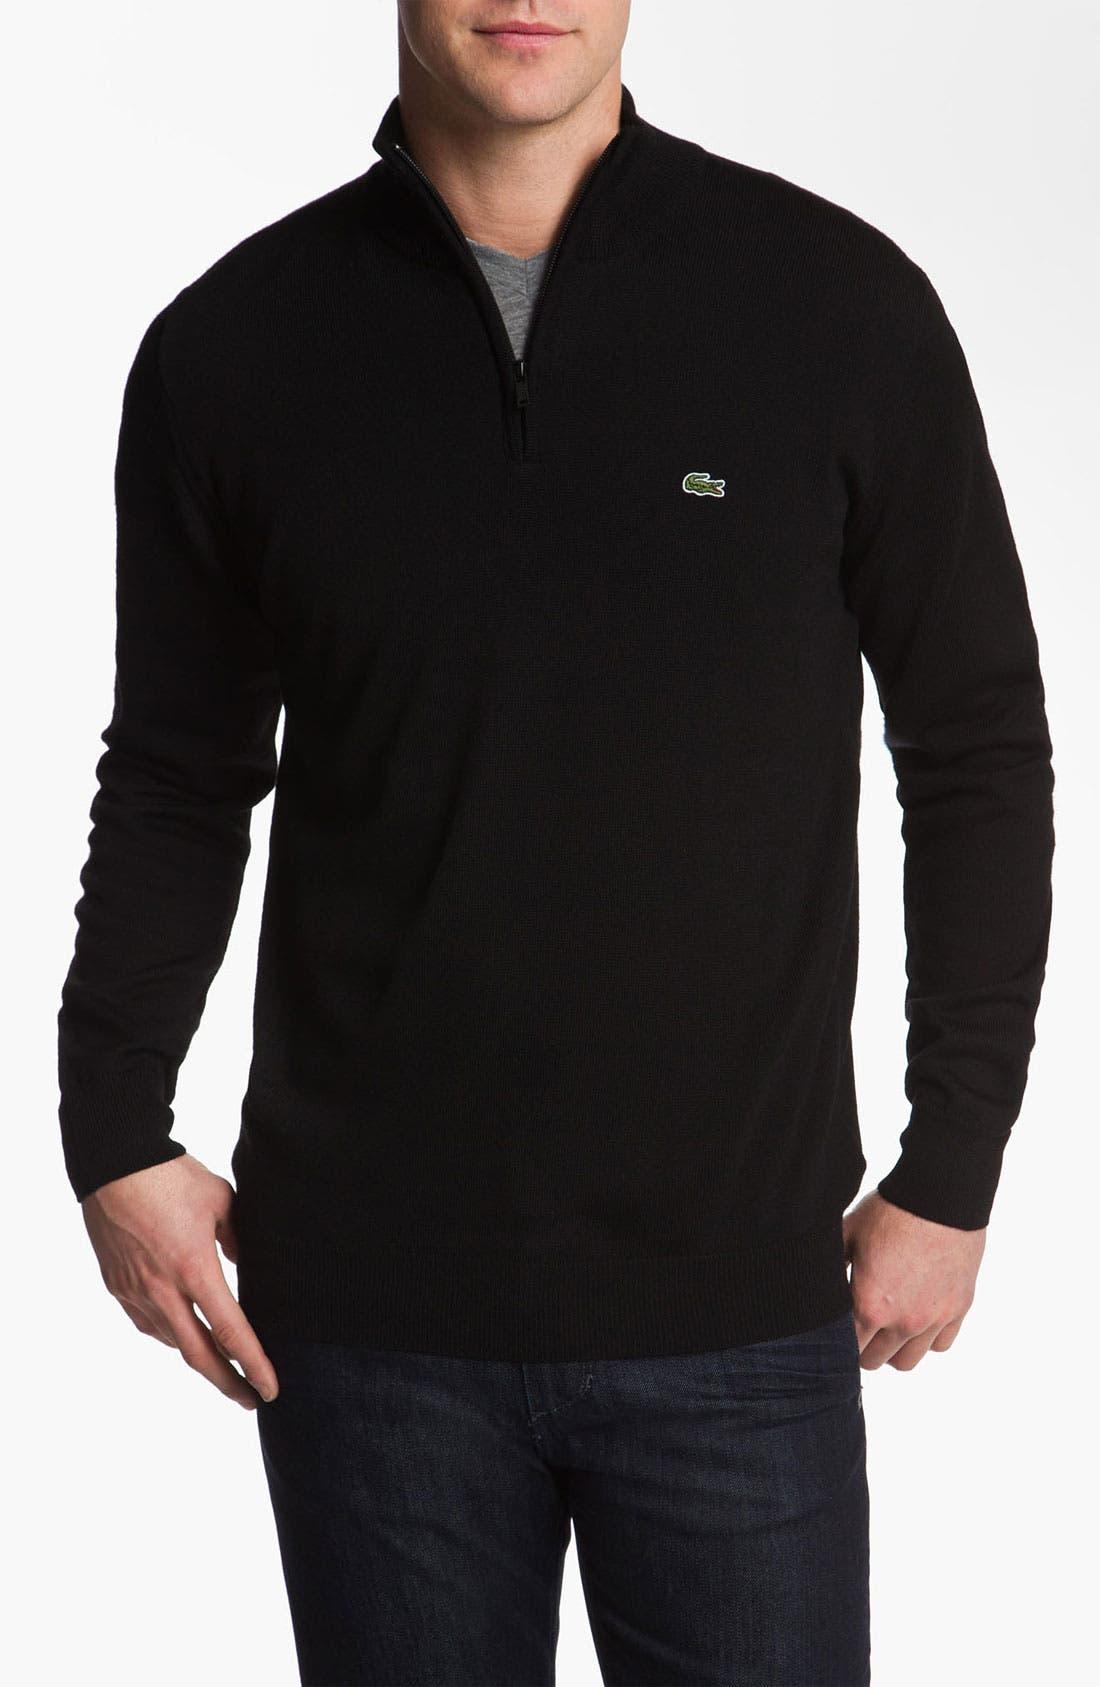 Main Image - Lacoste Lambswool Mock Neck Sweater